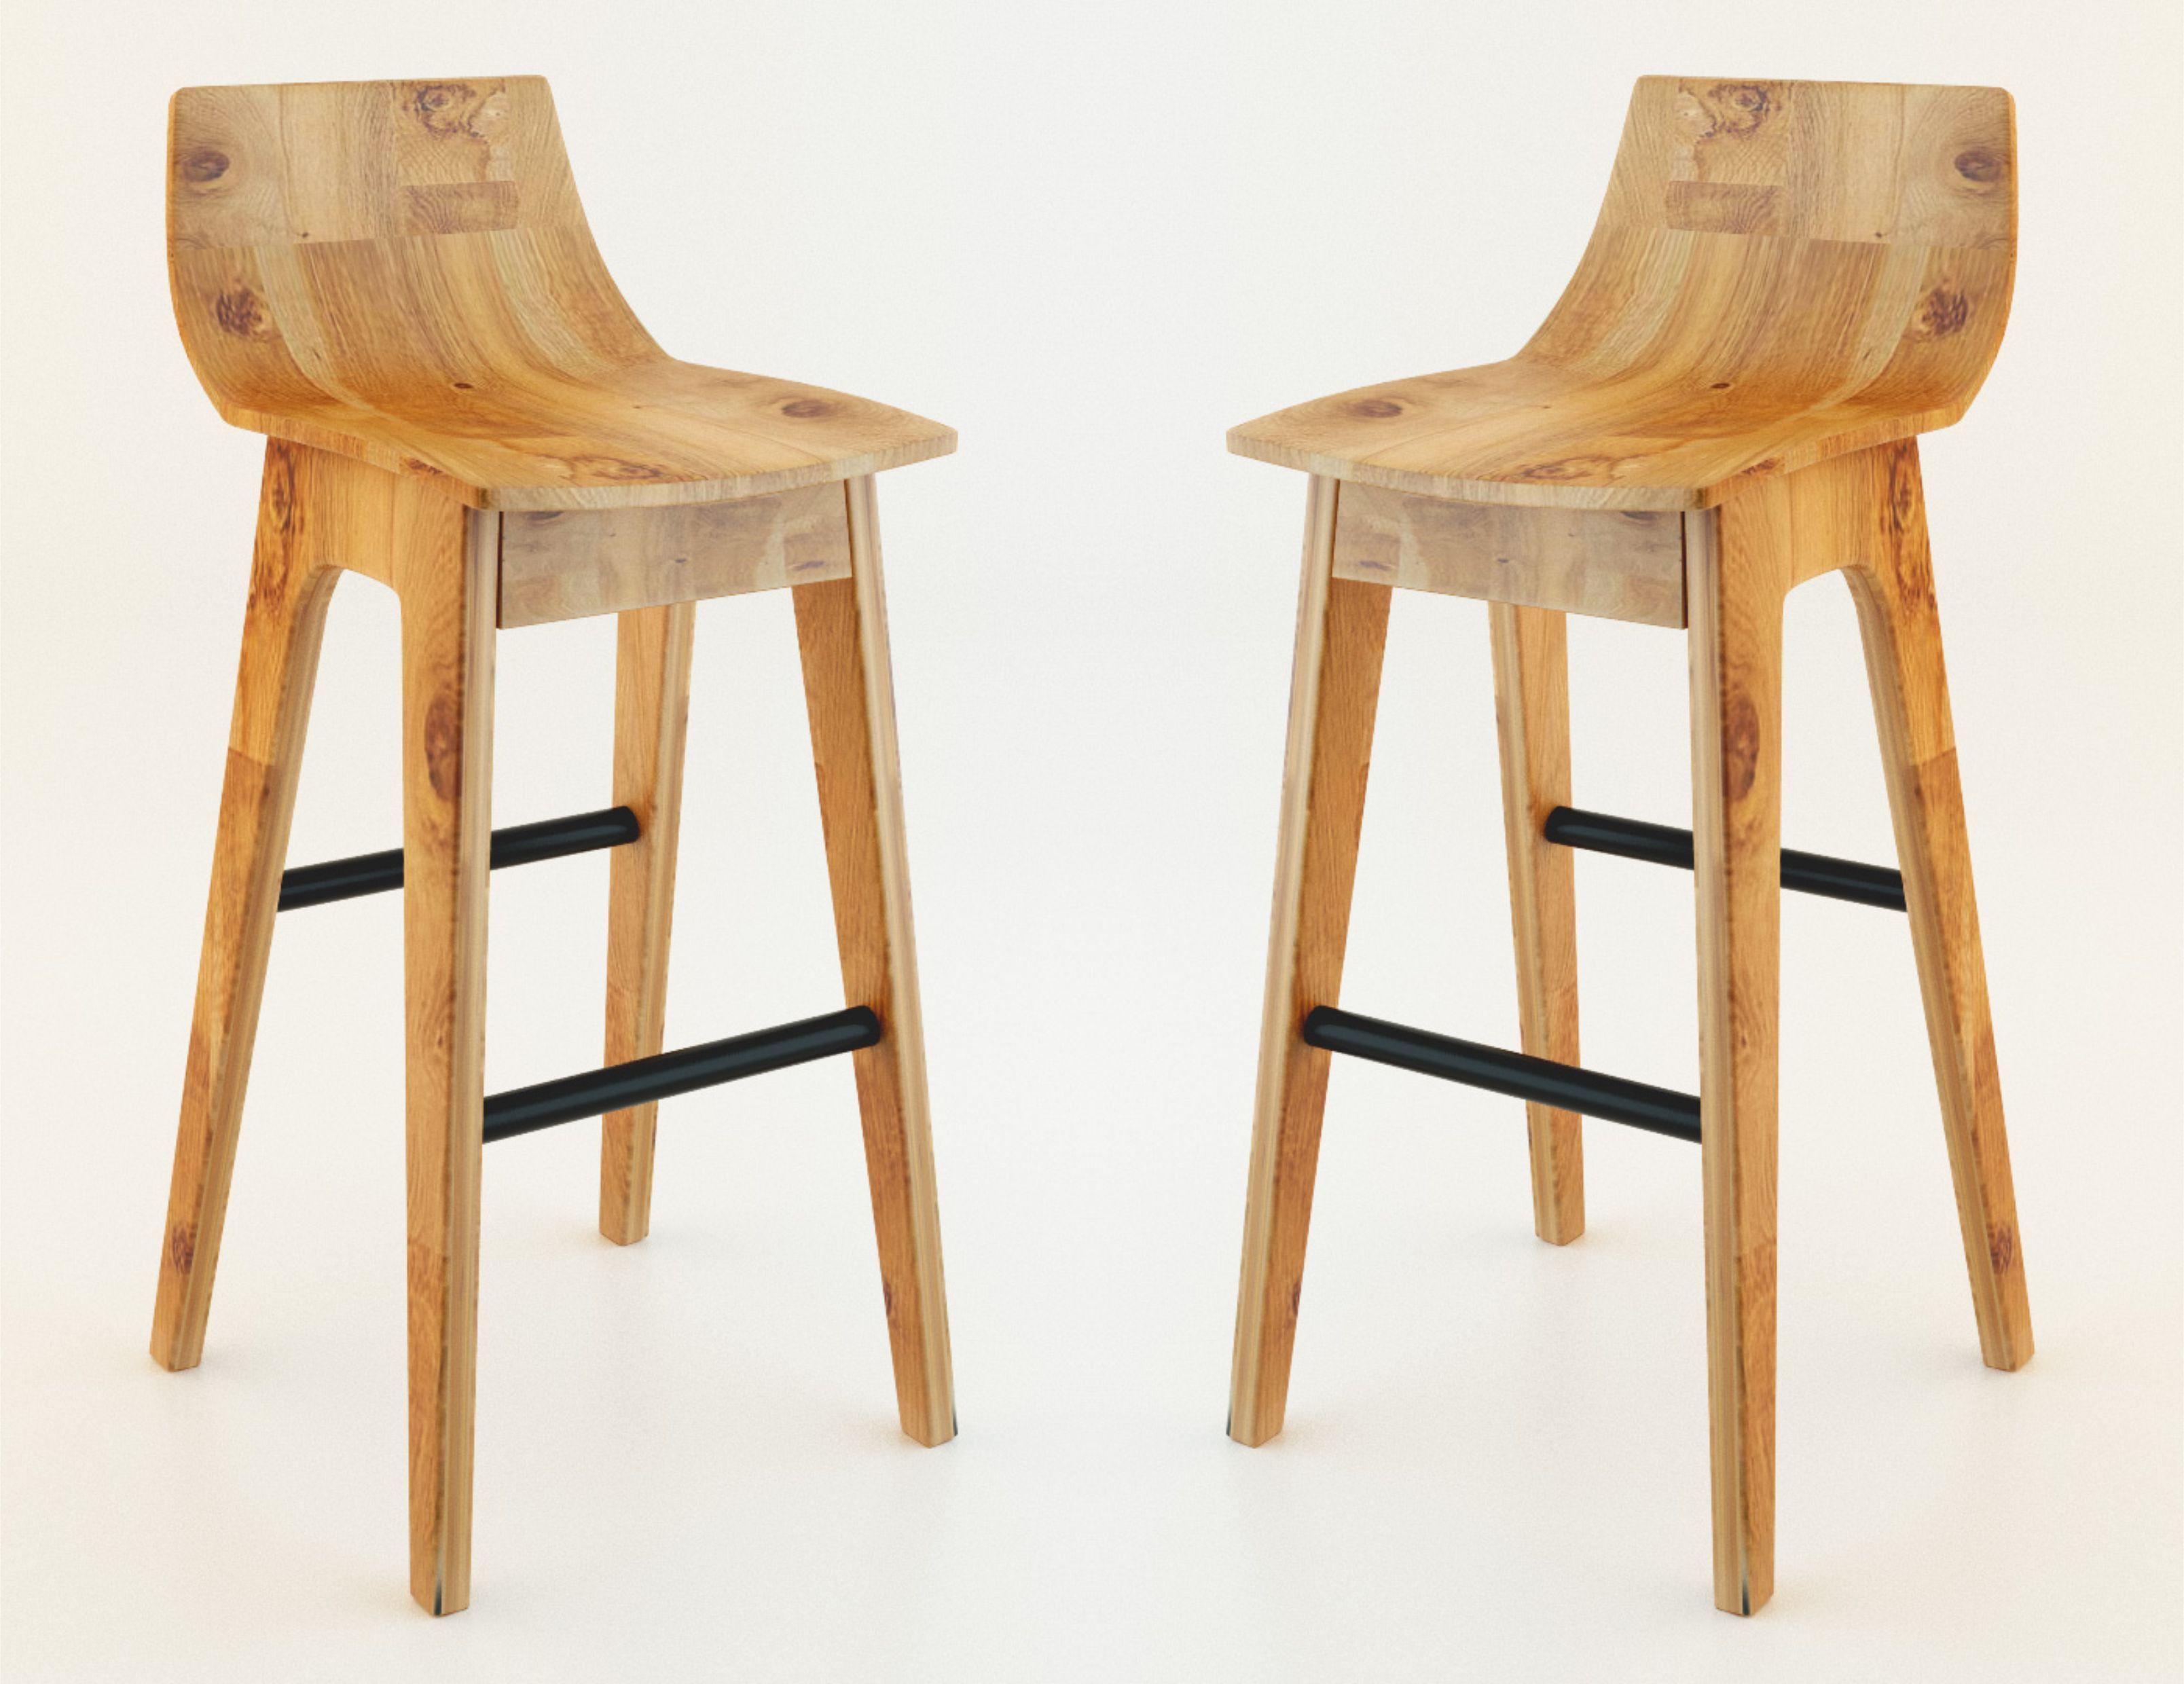 Wooden bar stool Wooden bar stool 3D model max 1 PGCBPEU